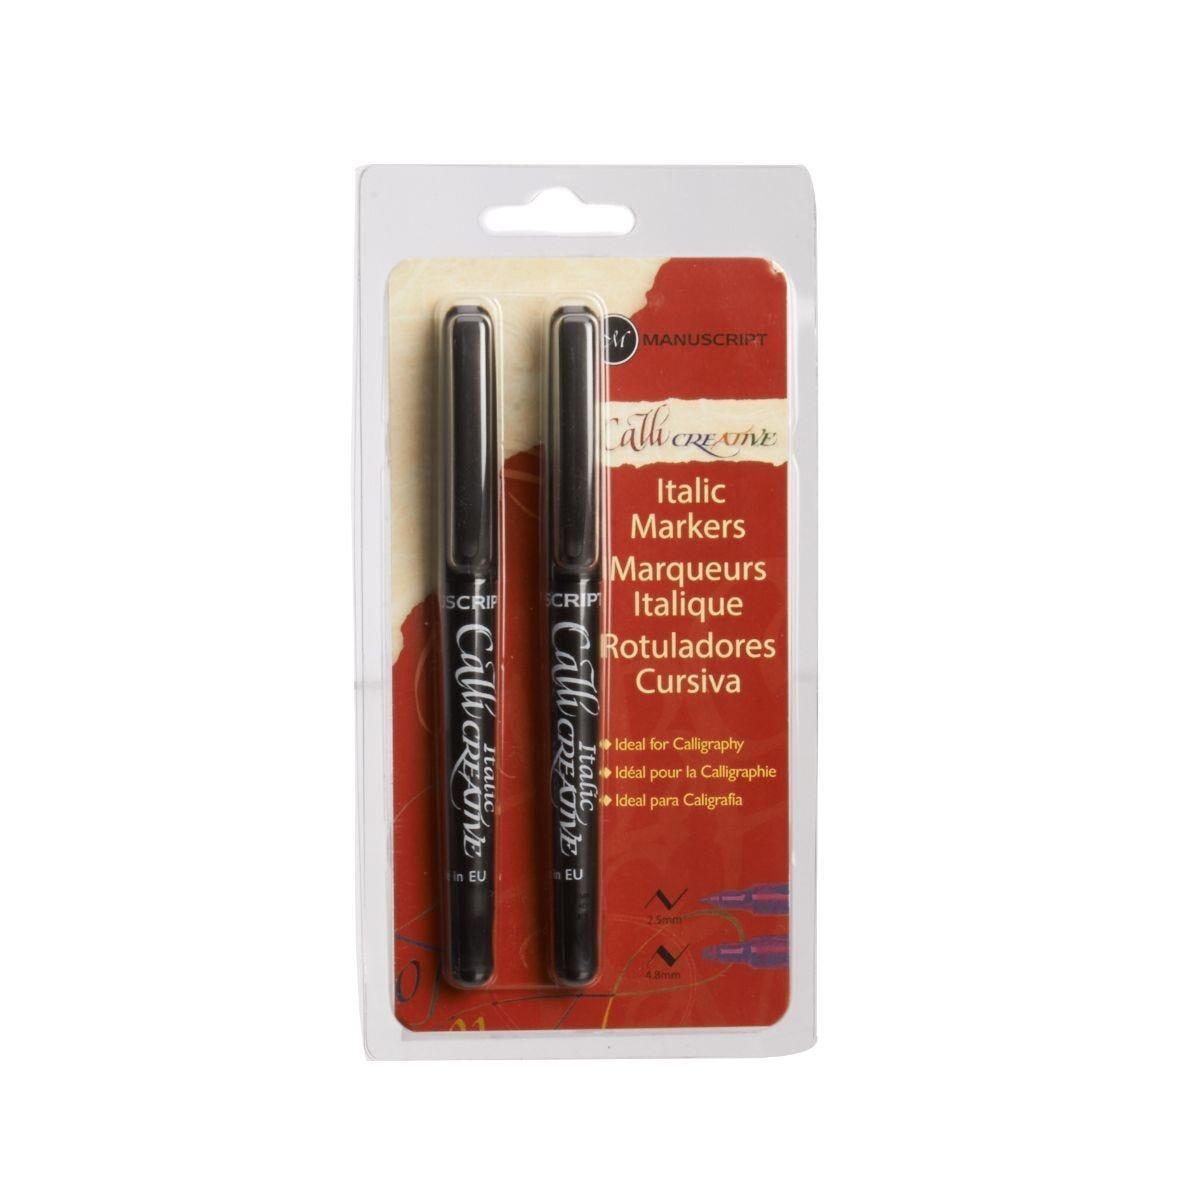 Manuscript Italic Markers Medium Extra Broad Pack of 2 Black